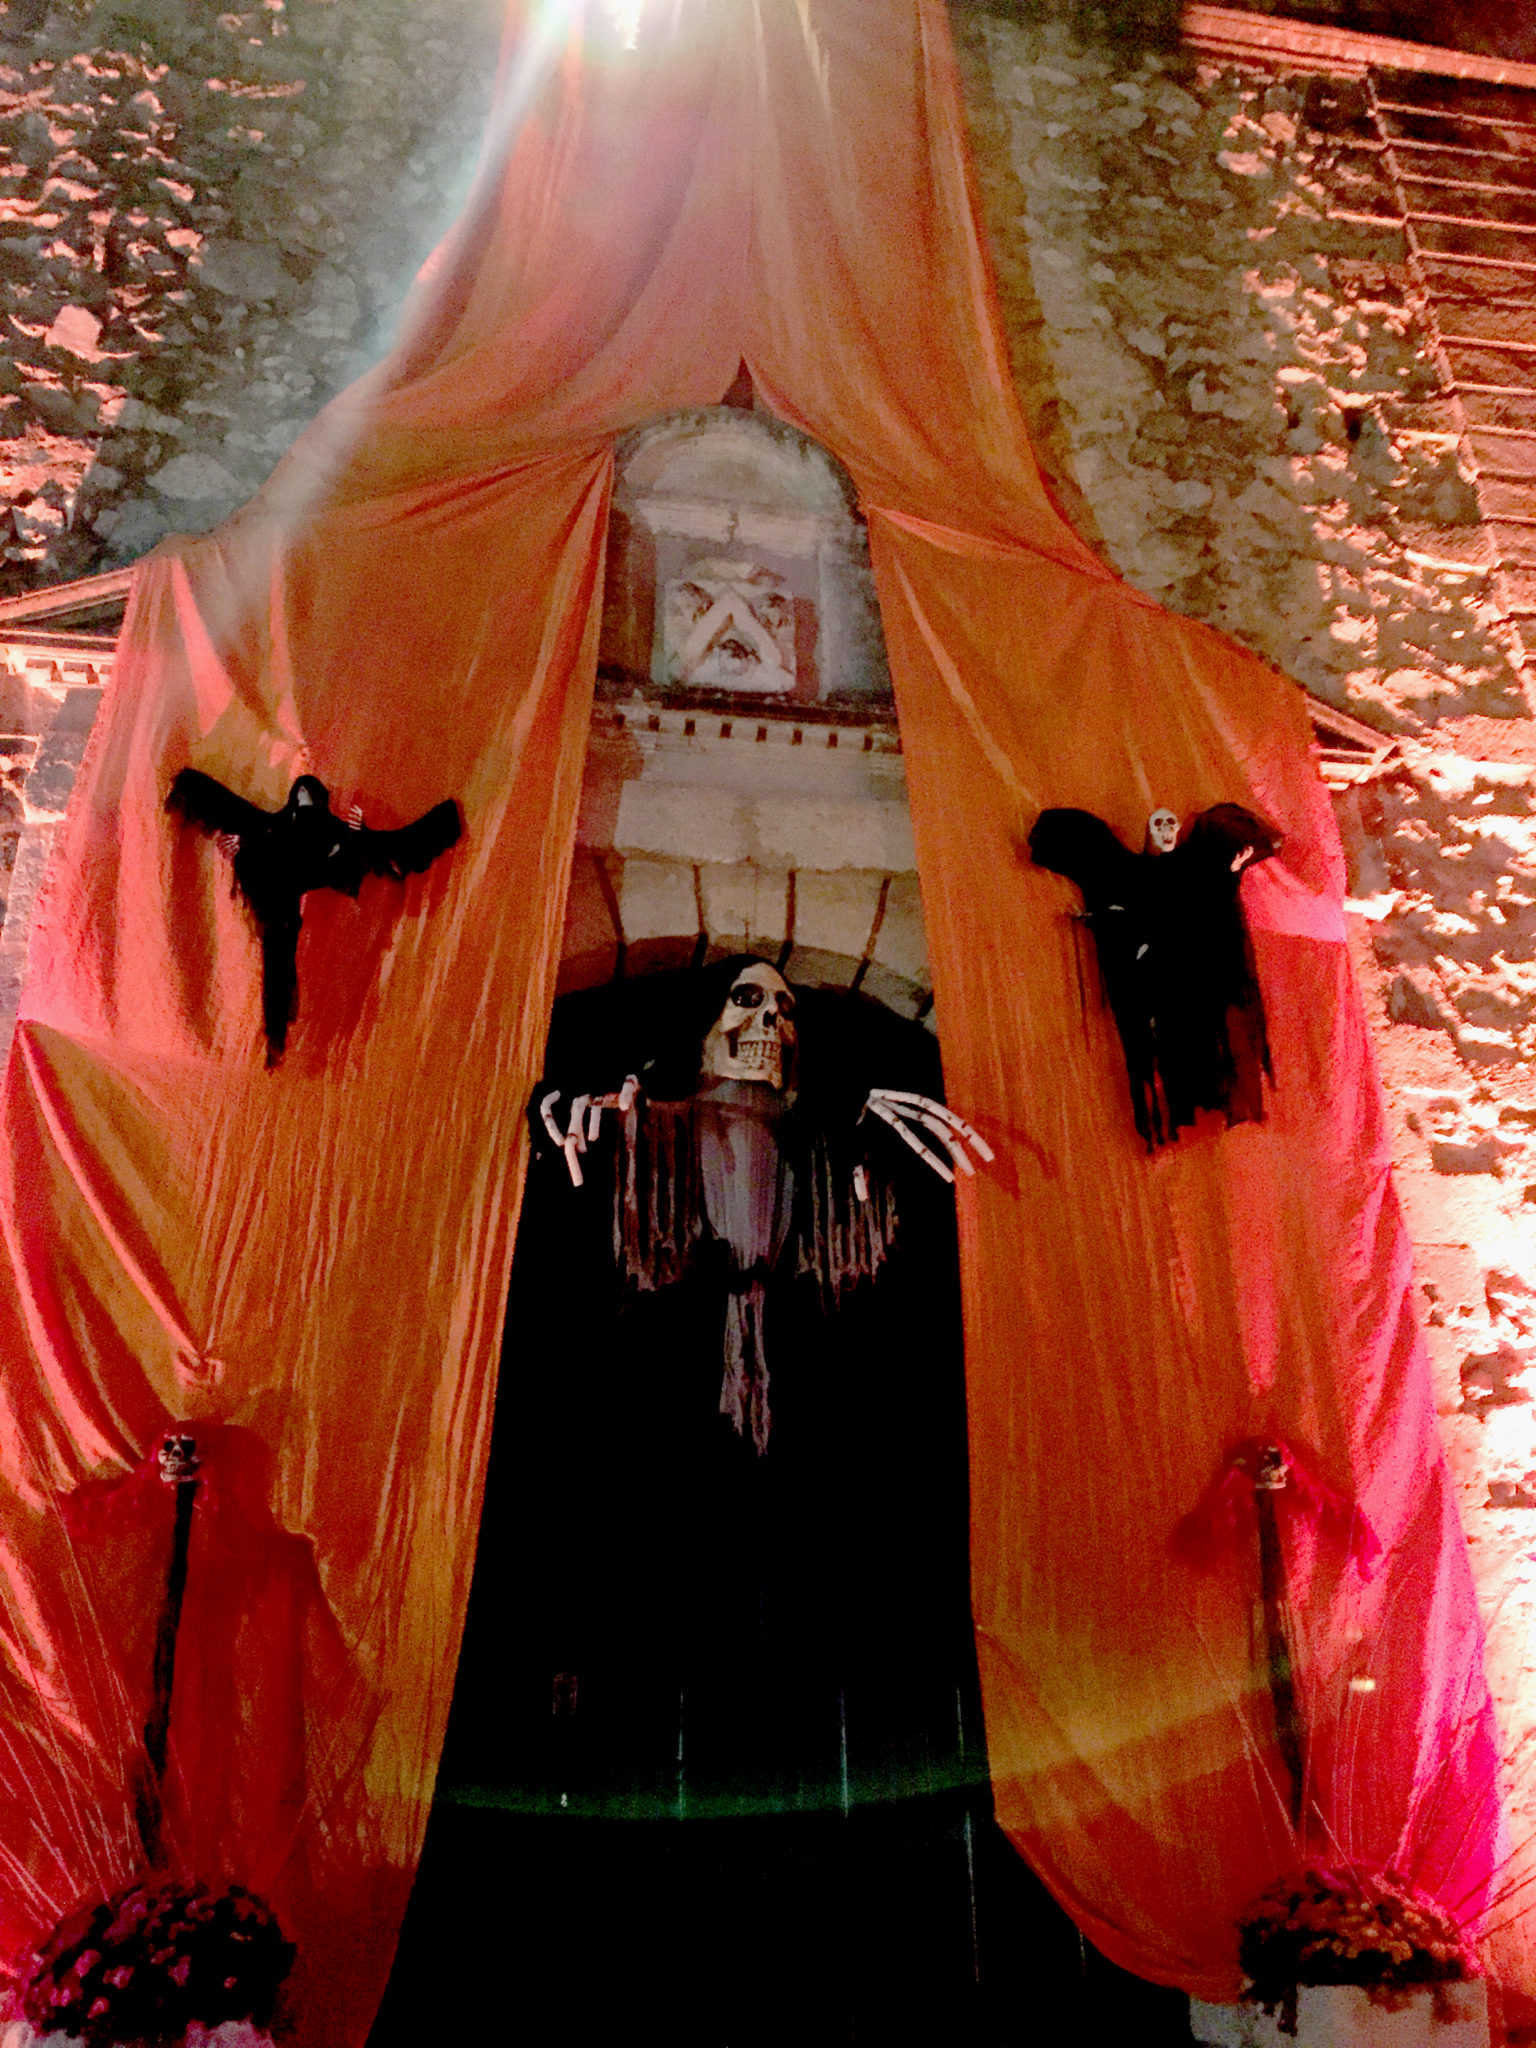 Hema_pose_ses_valises_halloween_chateau_de_la_barben_3